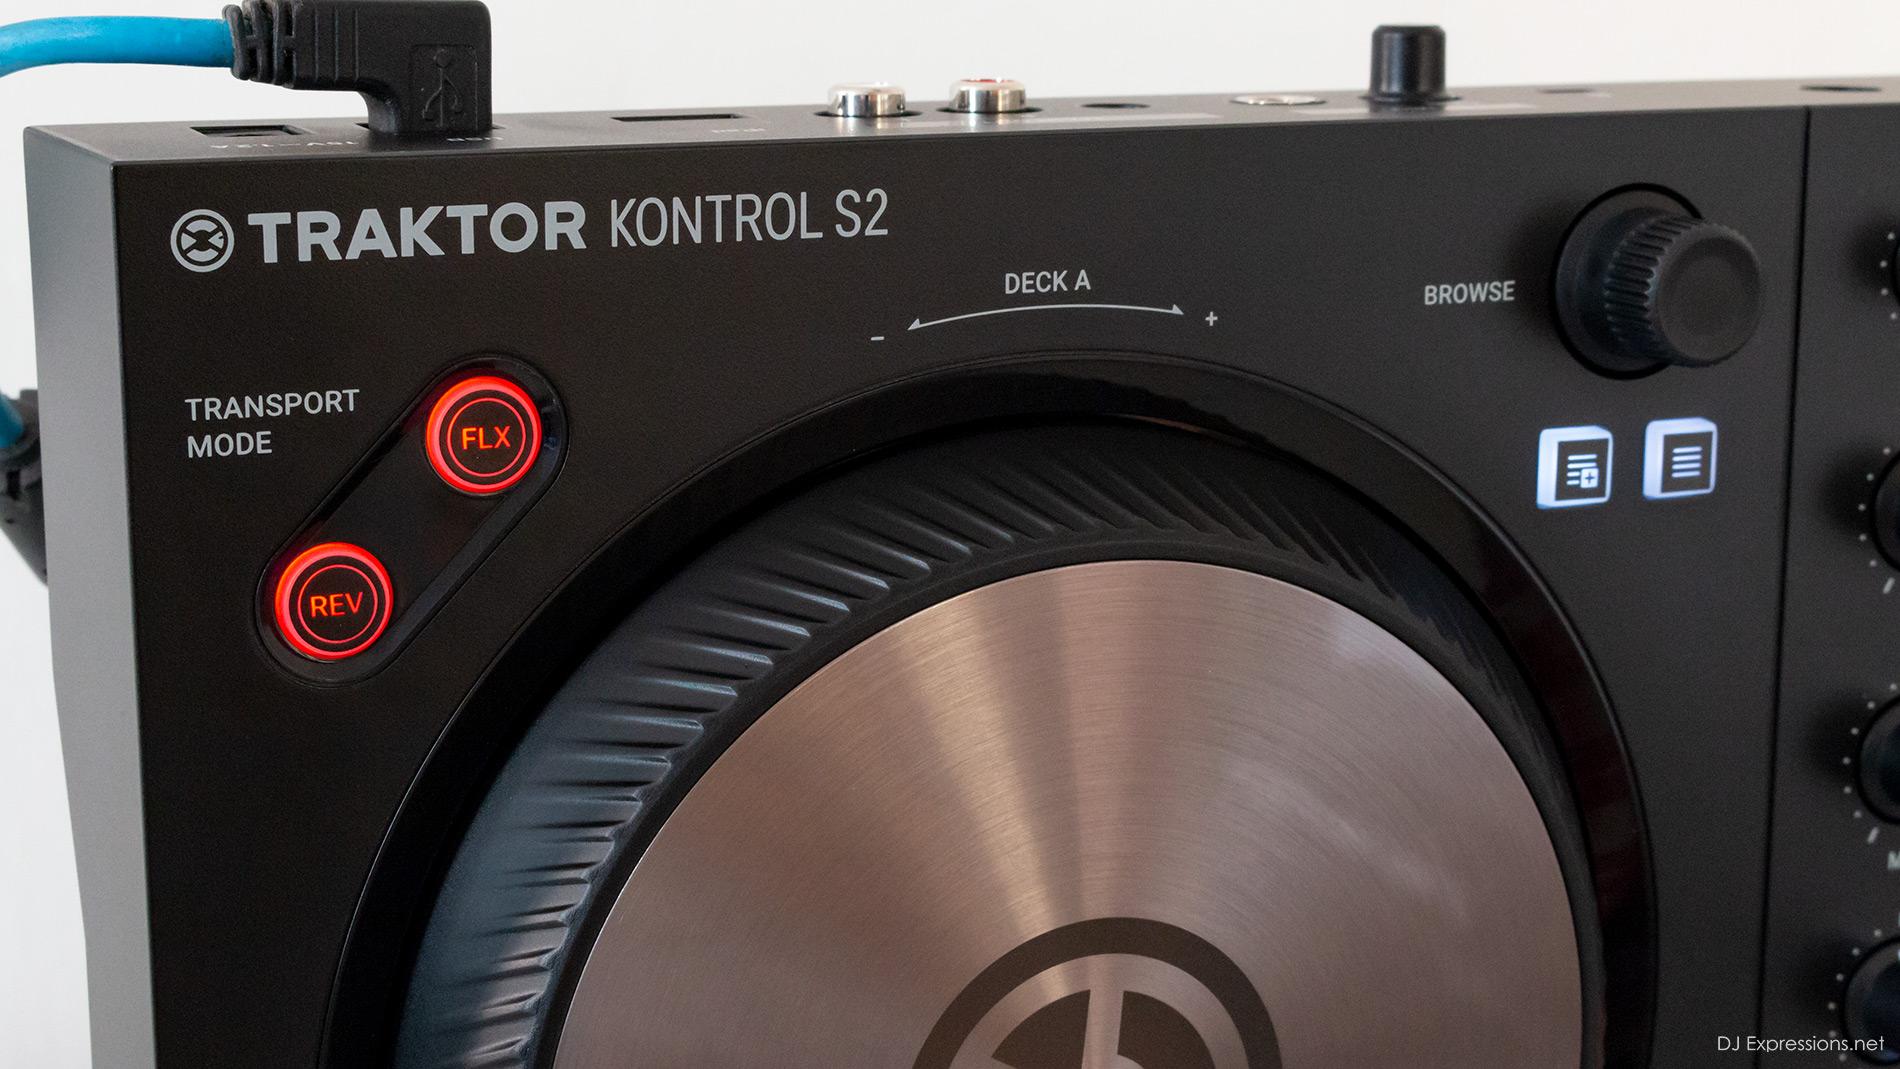 Traktor Kontrol S2mk3 Review - FLX, REV